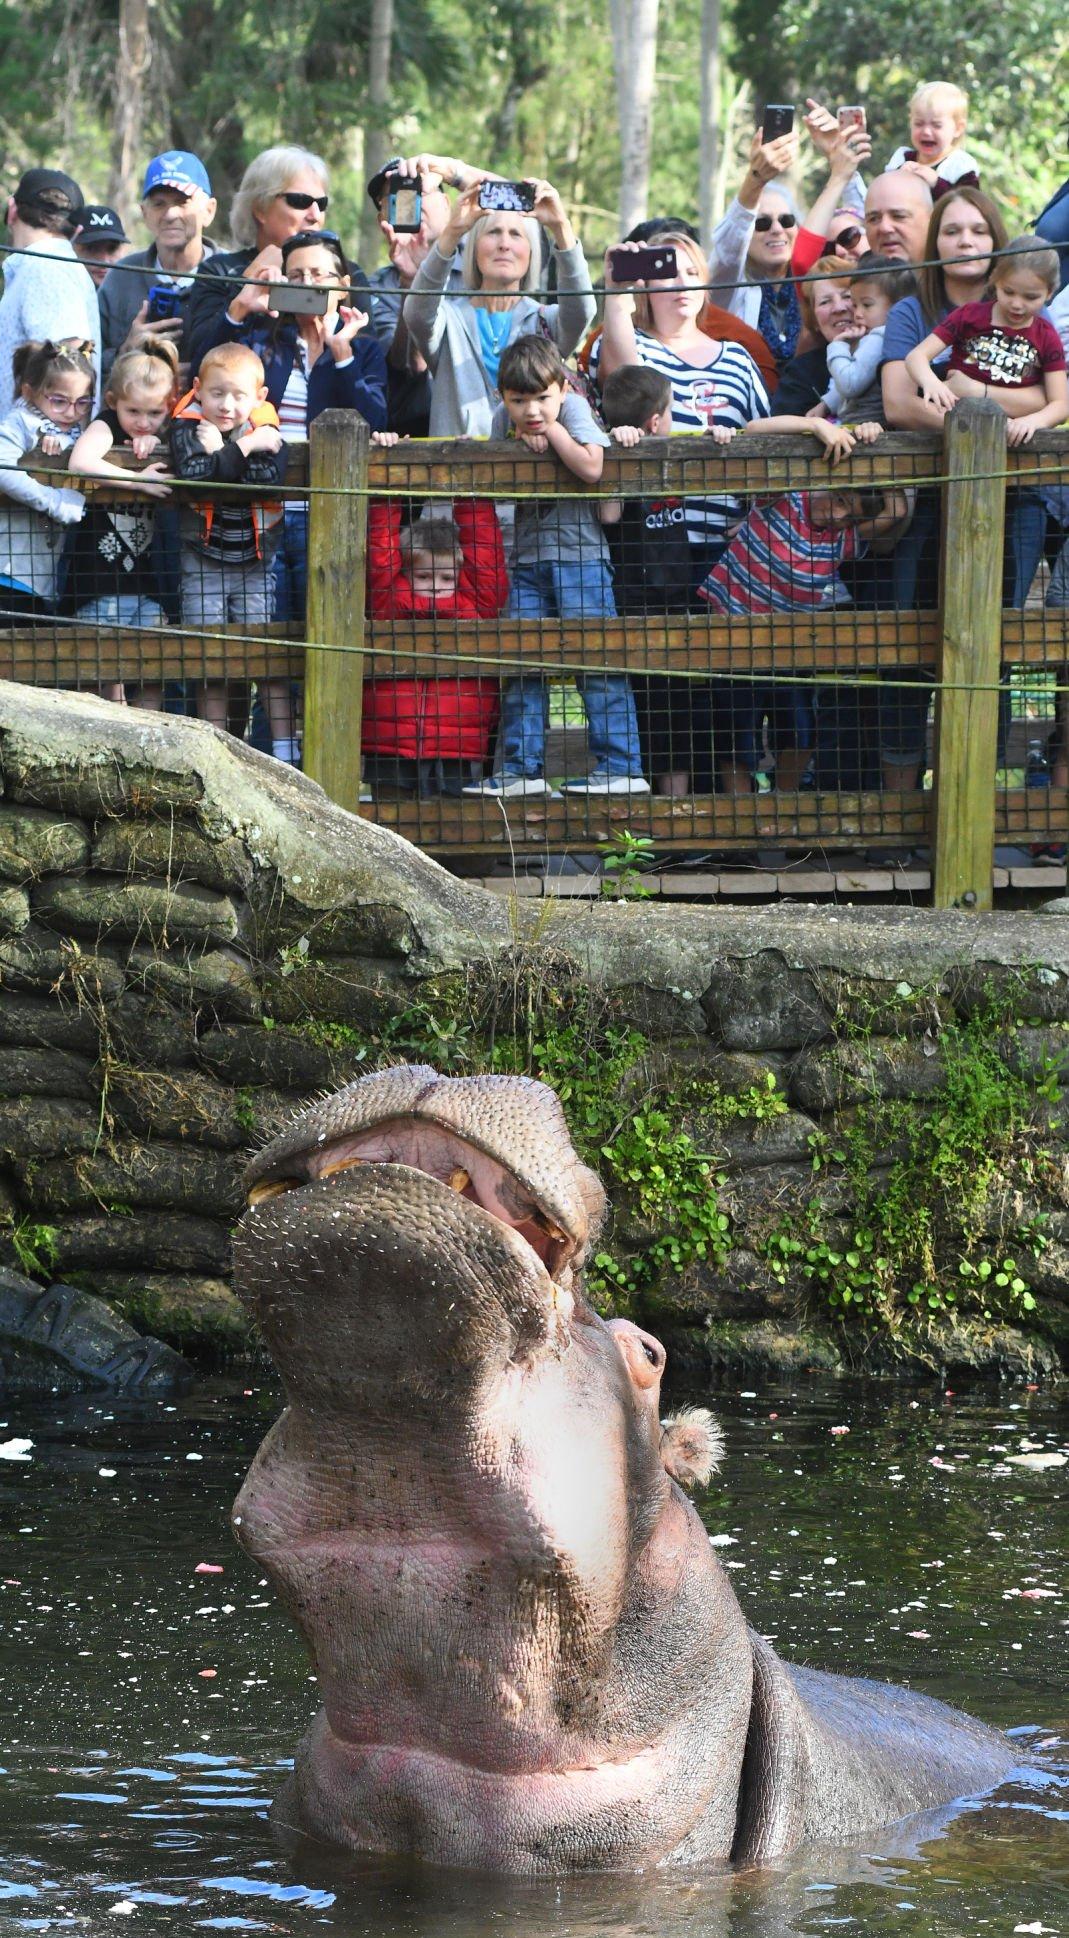 Wildlife park visitors celebrate 60 years with Lu